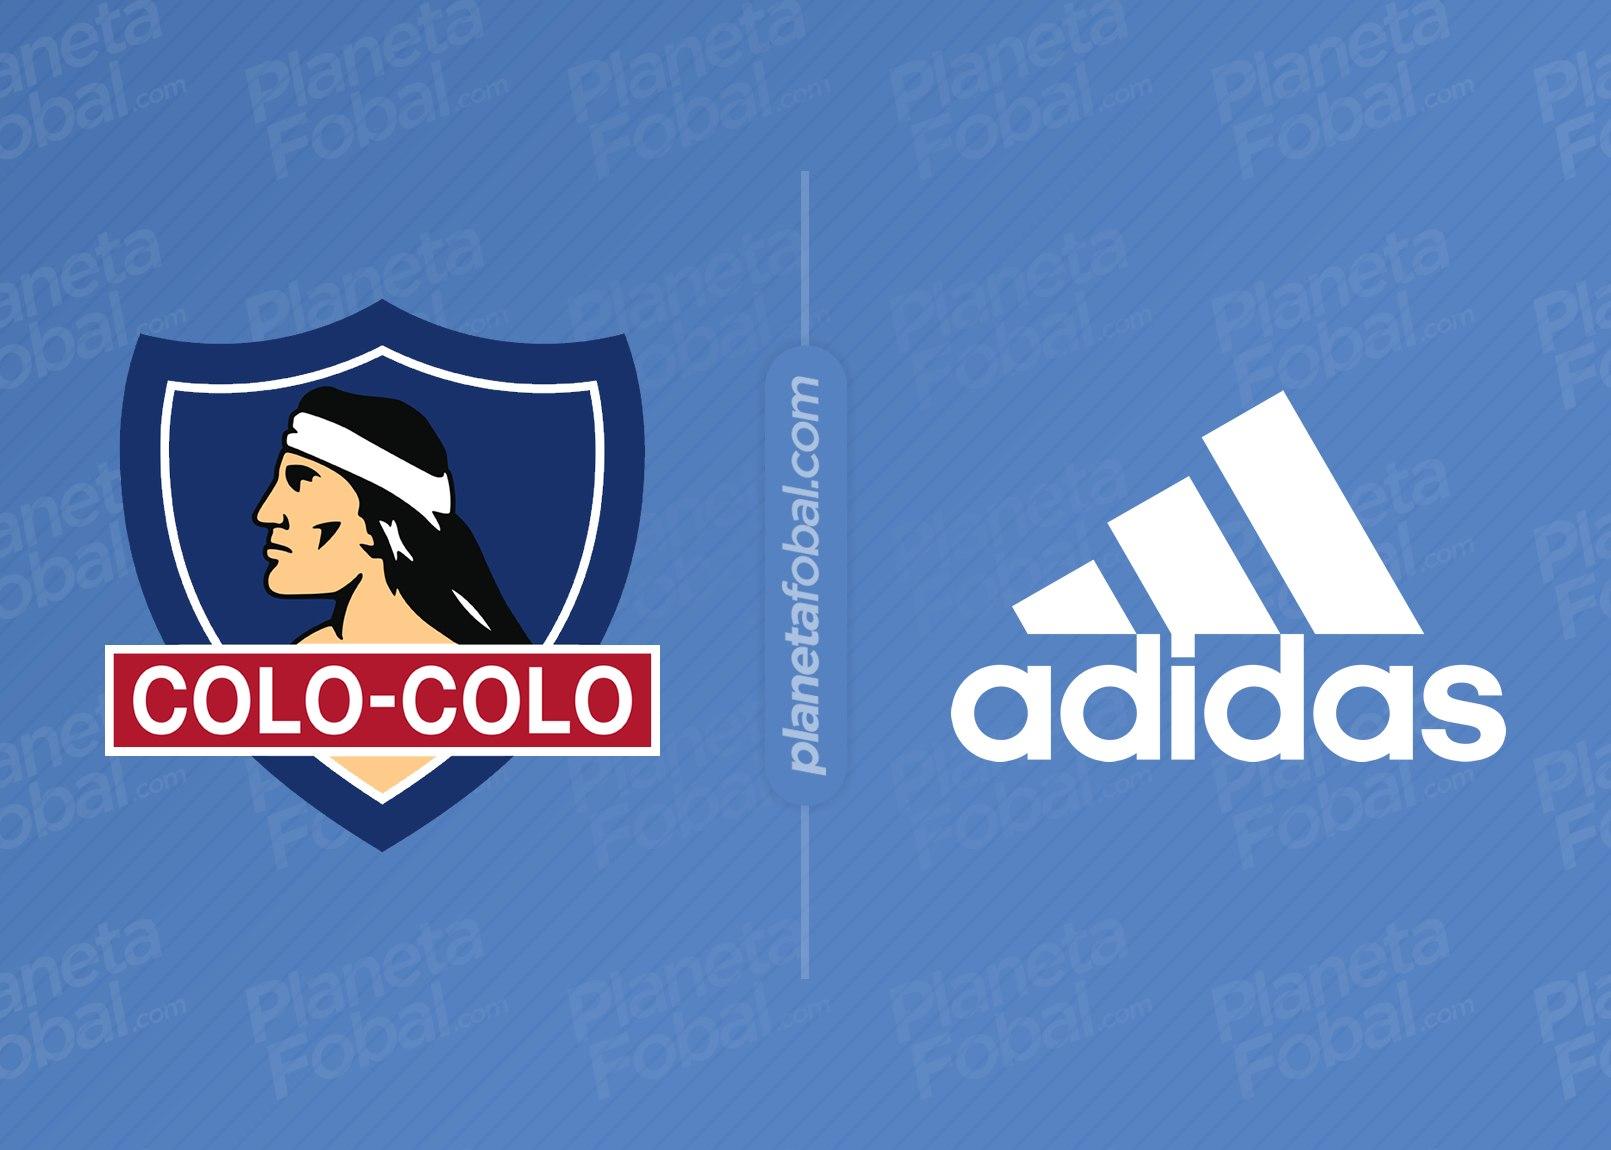 Colo-Colo anuncia contrato con adidas